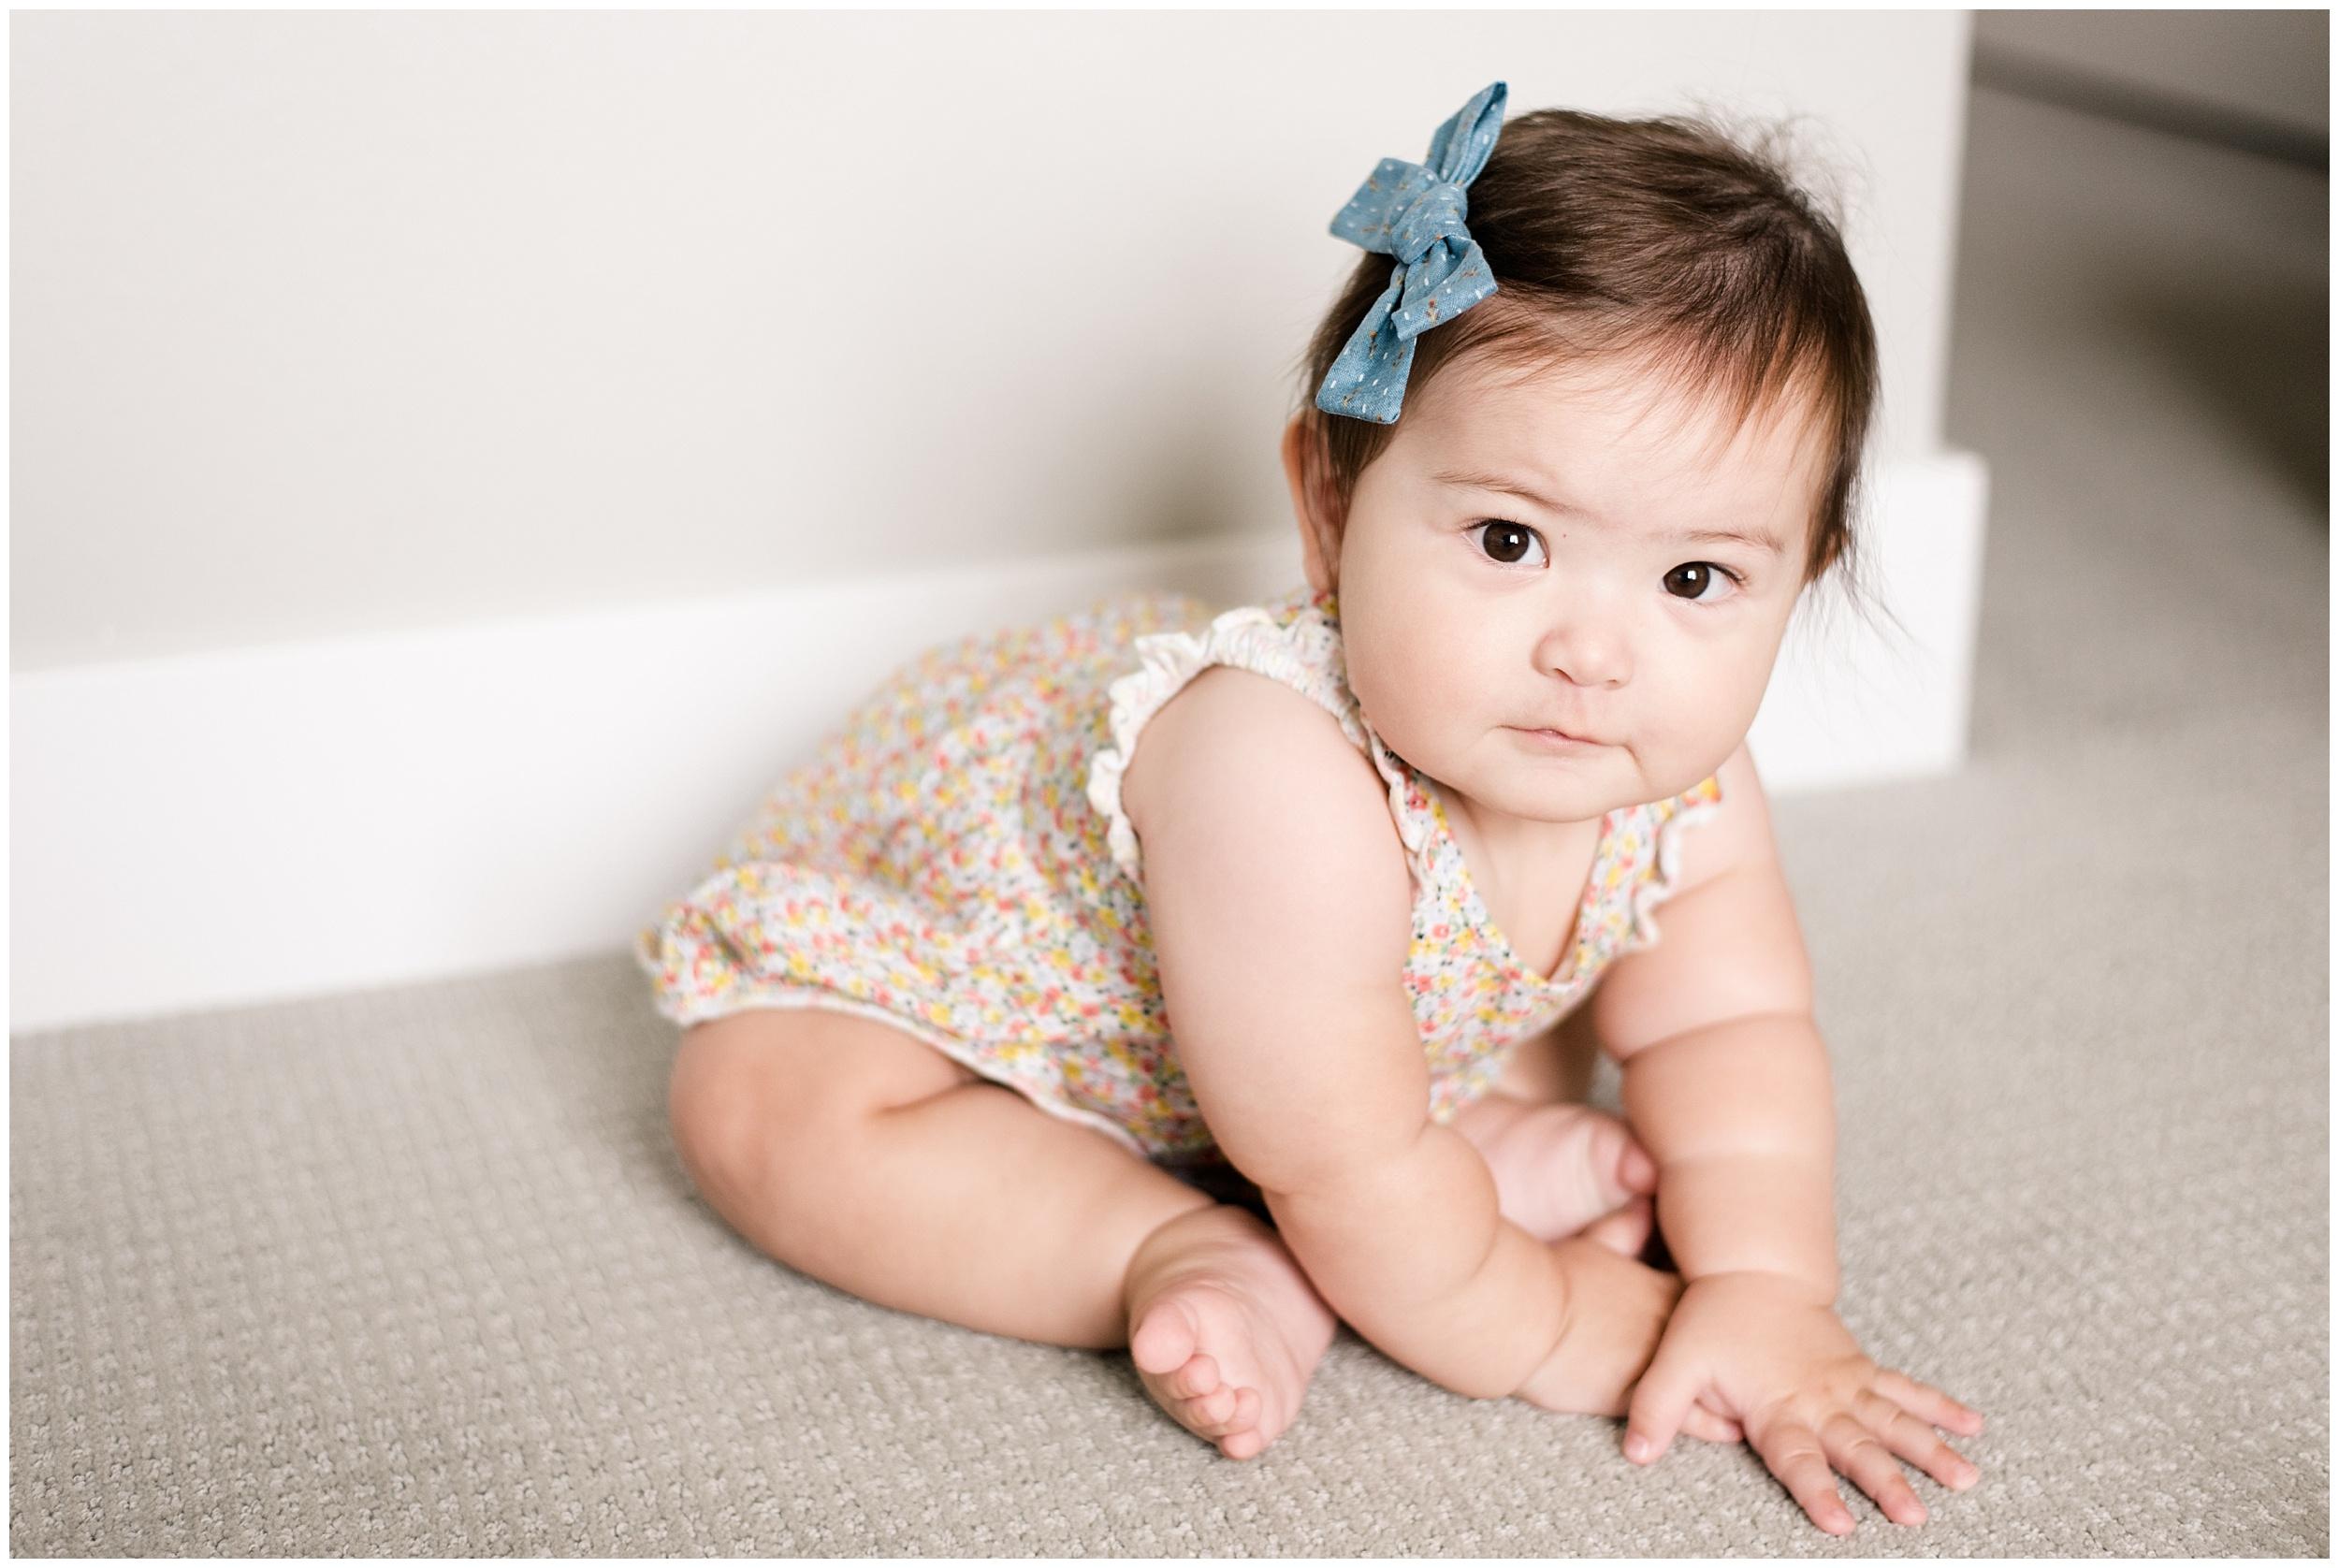 milwaukee-mom-photographer-9-month-old-photography_0015.jpg